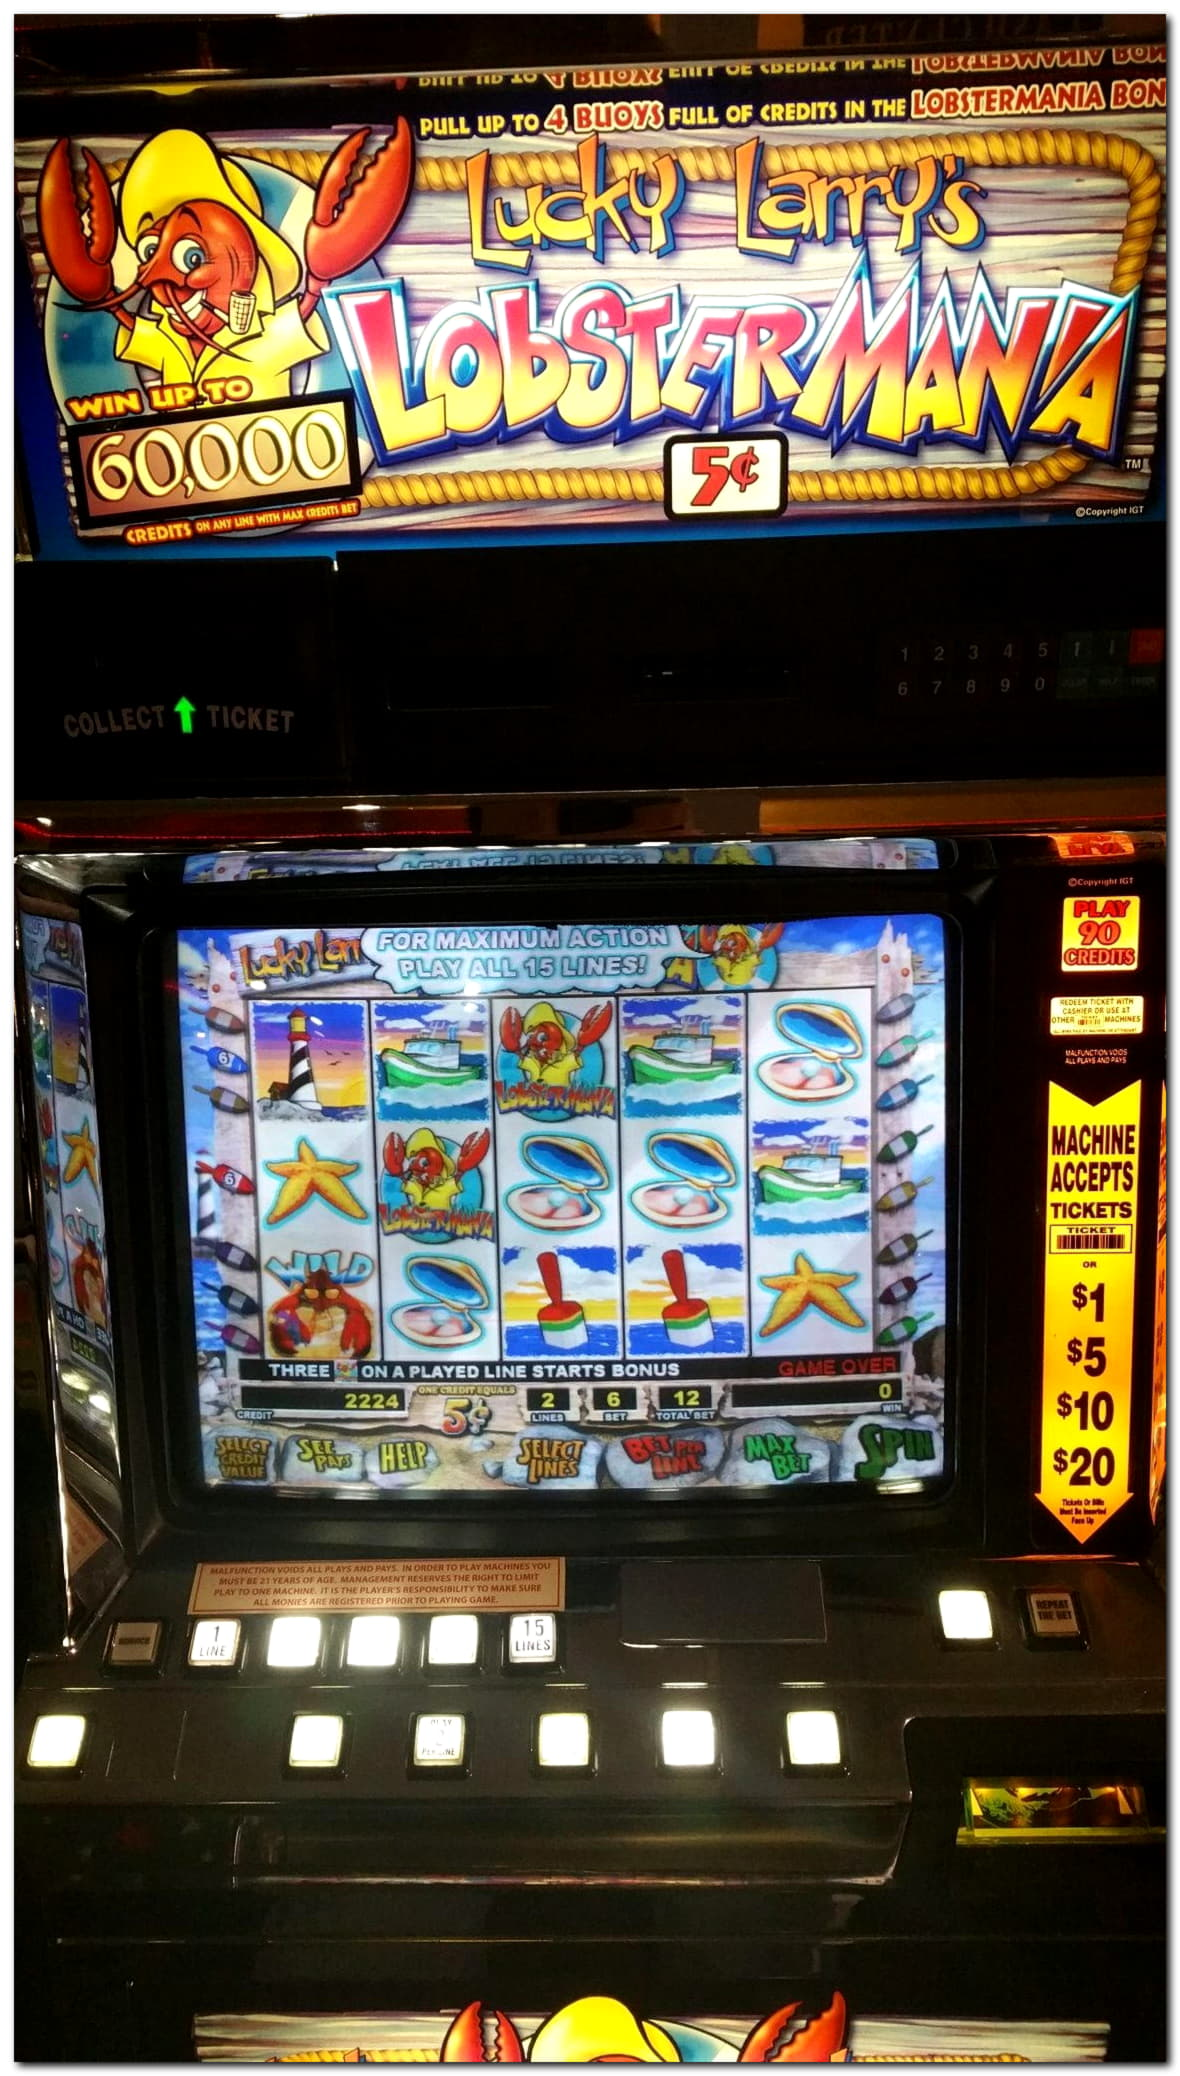 $395 Free casino chip at Guts Casino